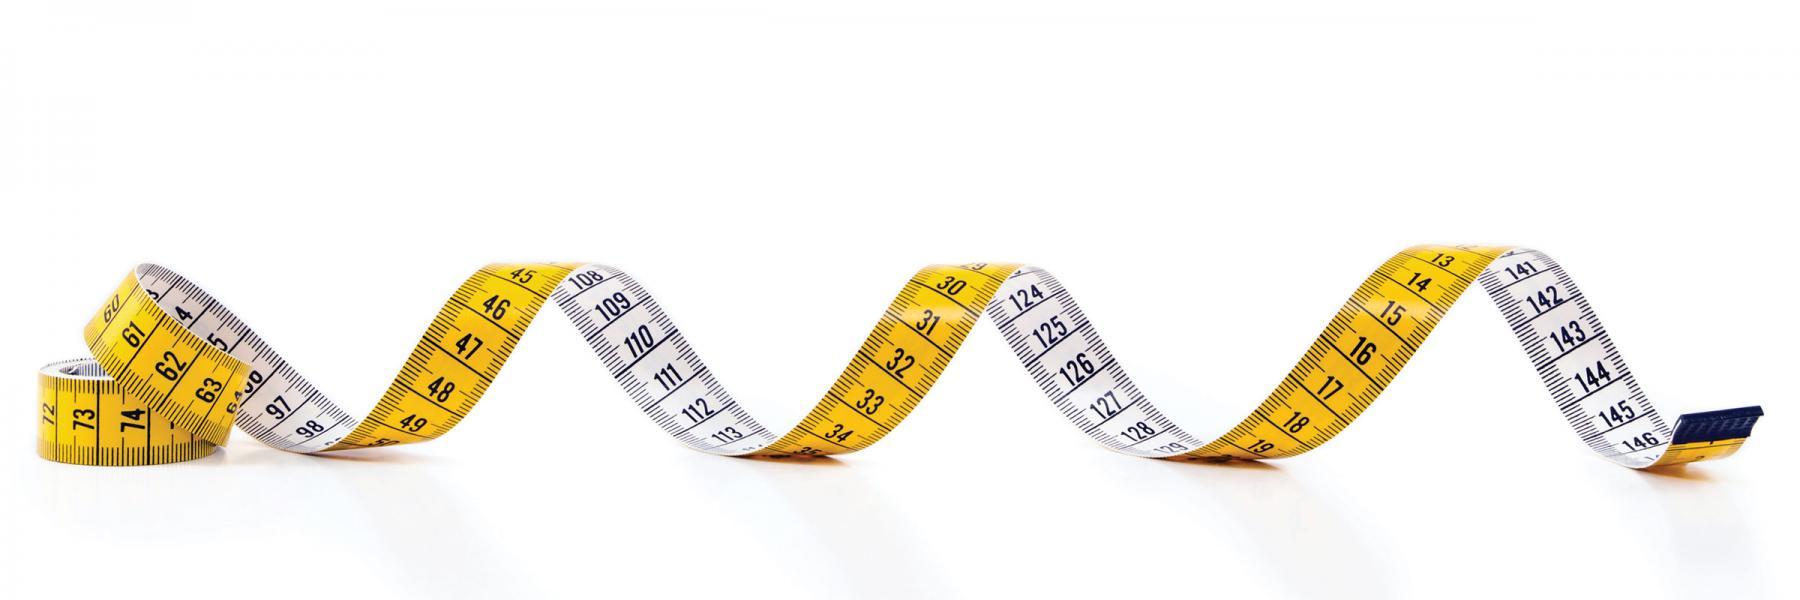 Measuring the HIV reservoir